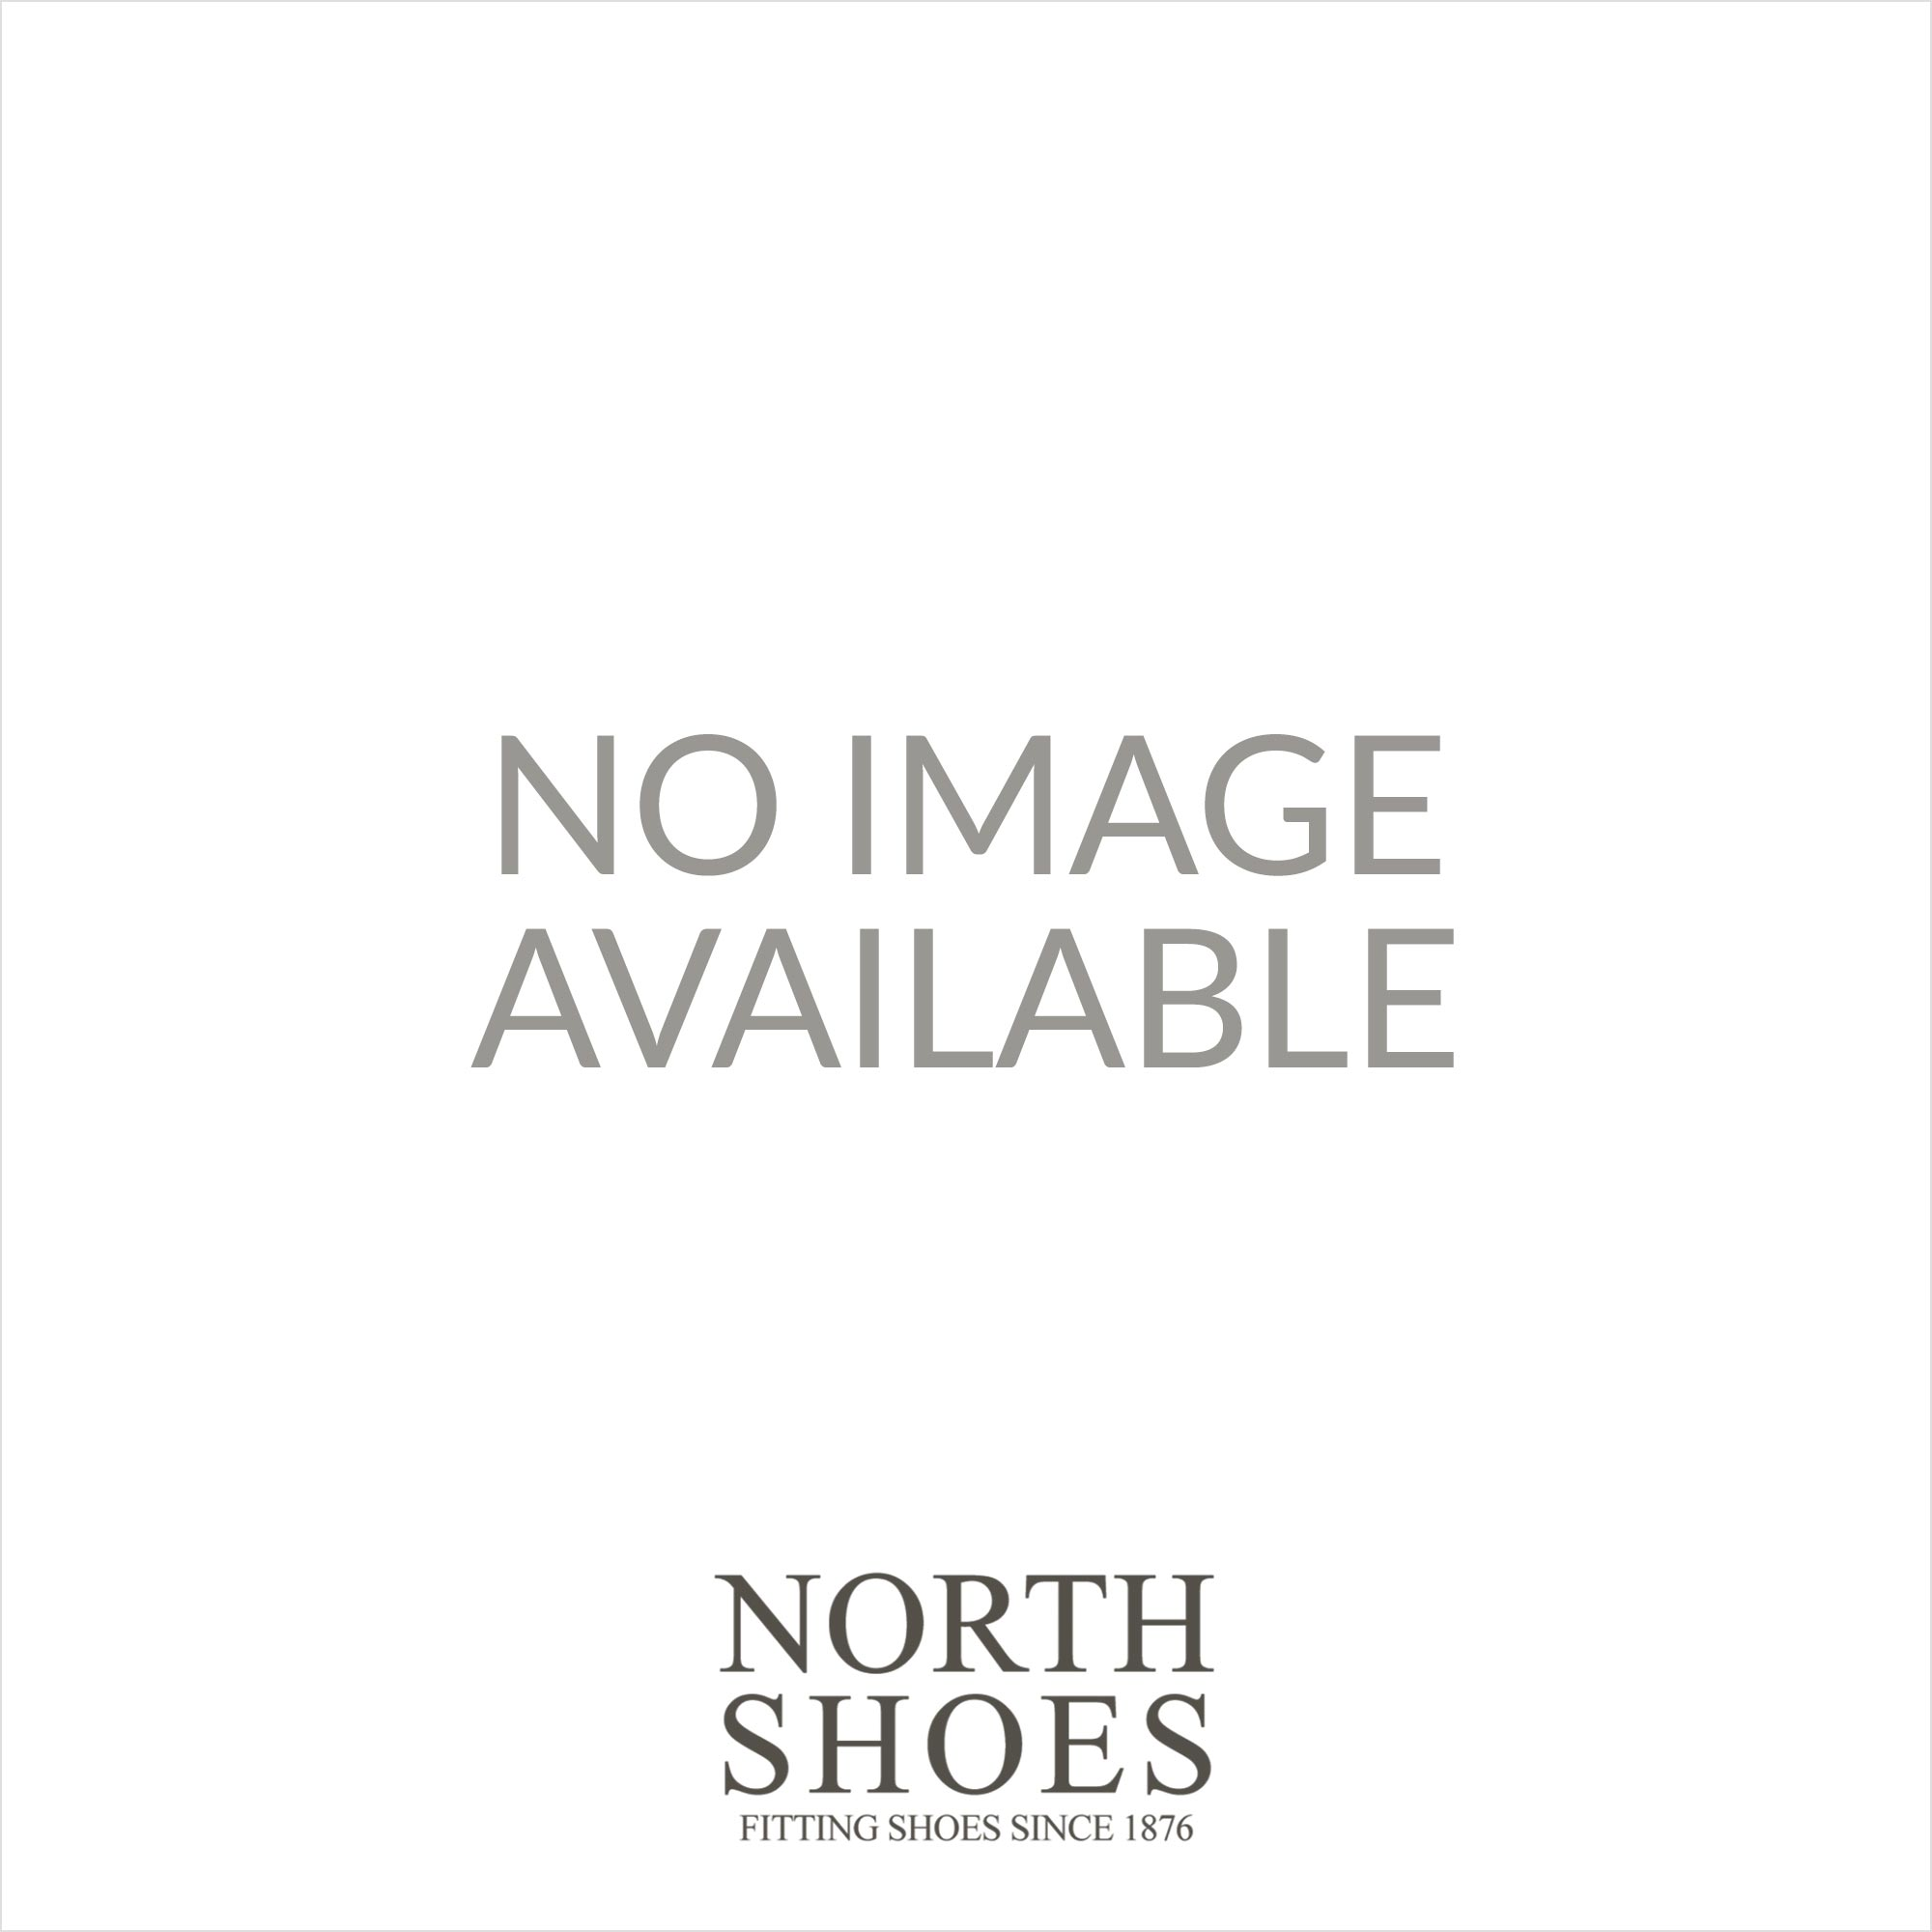 cef0e54aeaf Clarks Petrina Selma Nutmeg Leather Womens Espadrille Buckle Wedge Sandal -  Clarks from North Shoes UK